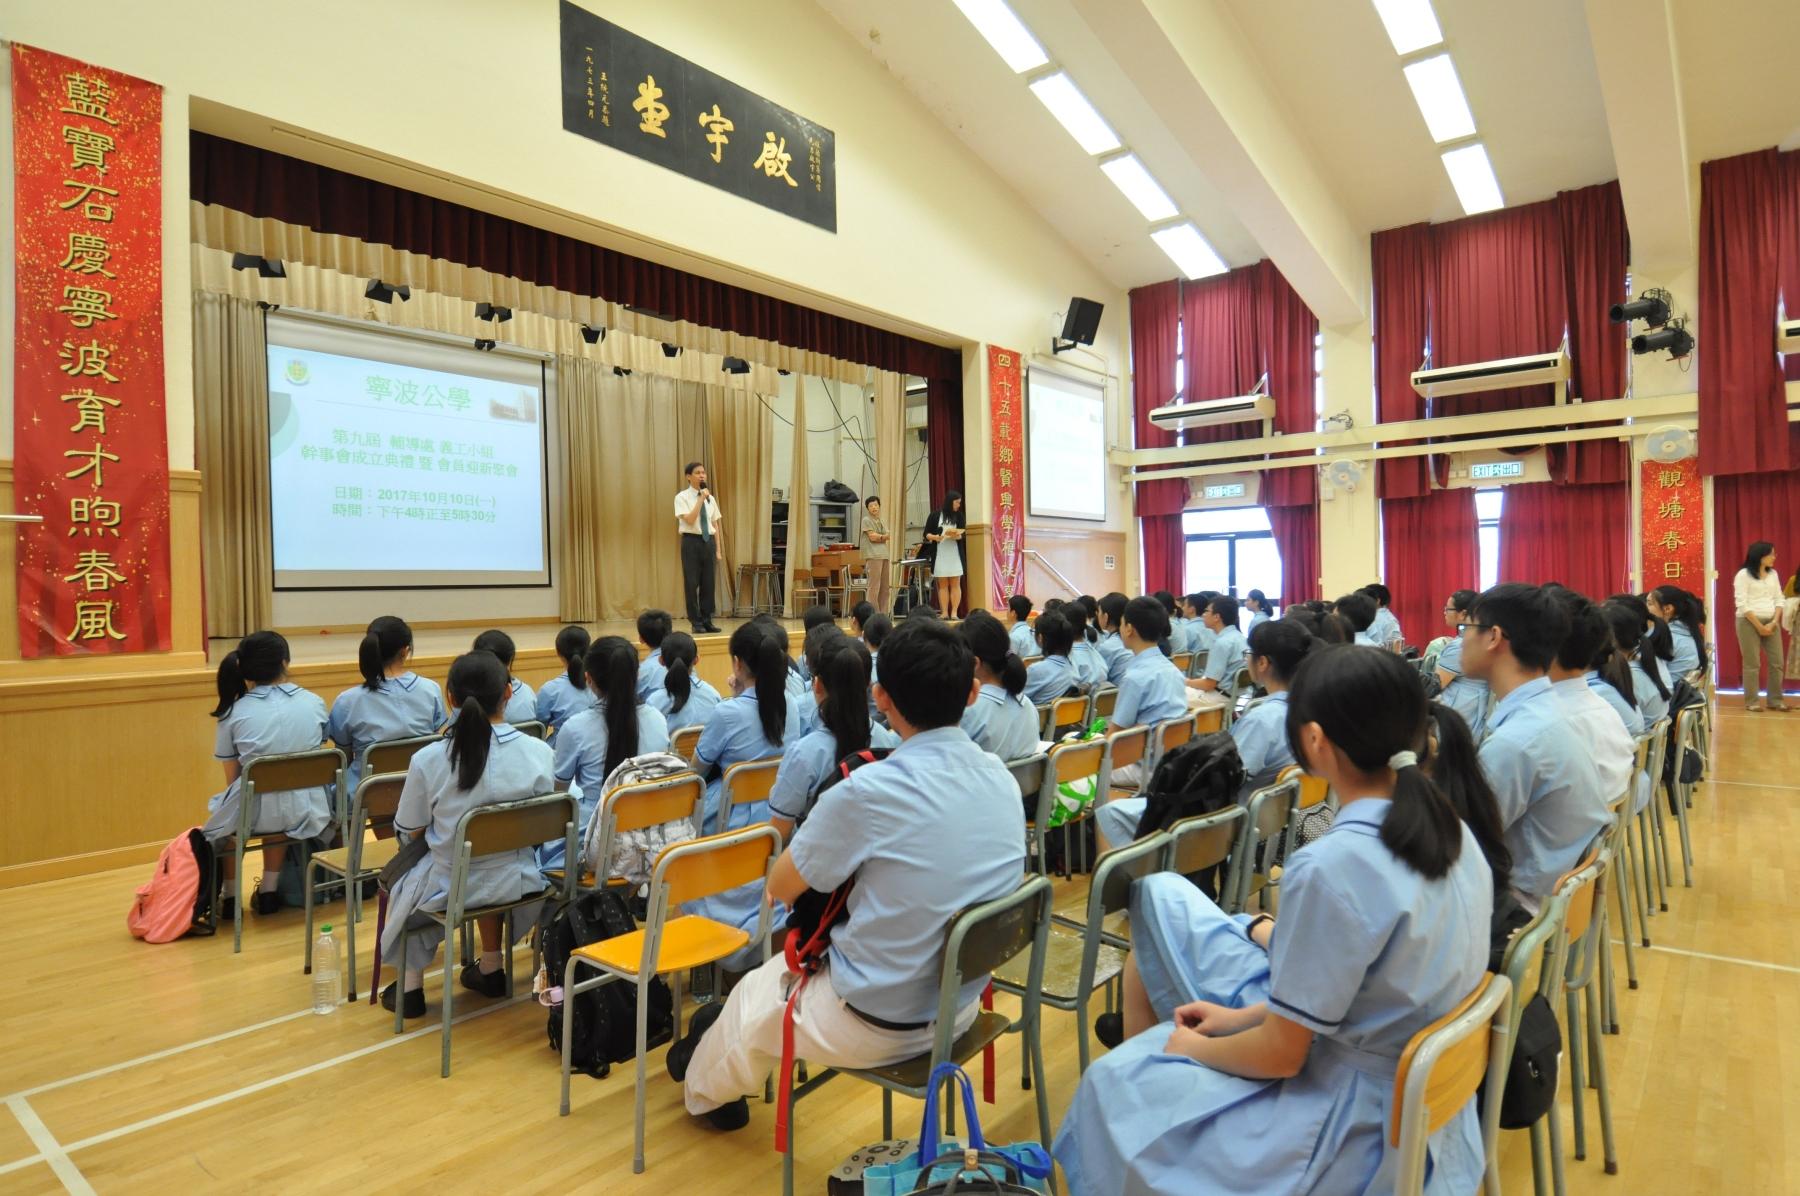 http://npc.edu.hk/sites/default/files/dsc_0020.jpg